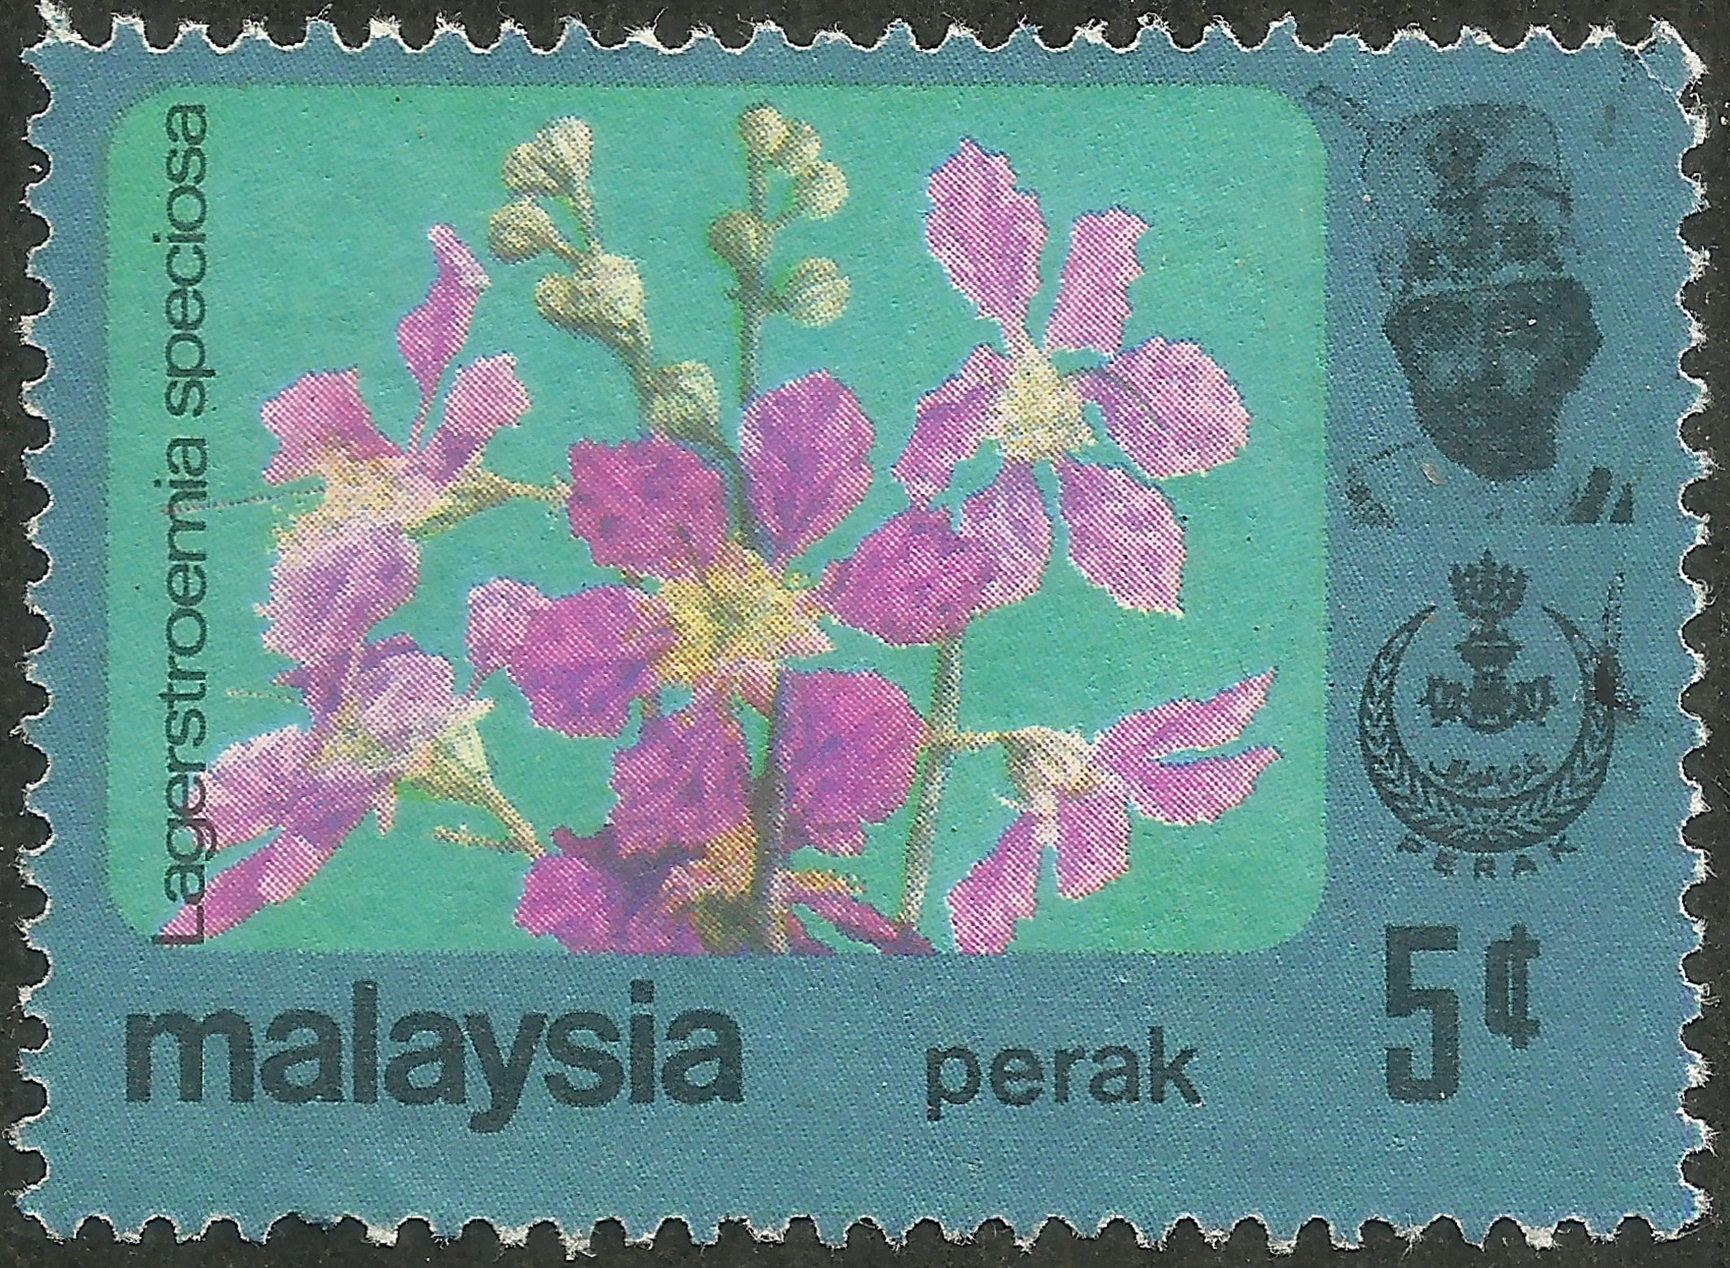 Perak [State of Malaysia] #155 (1979)